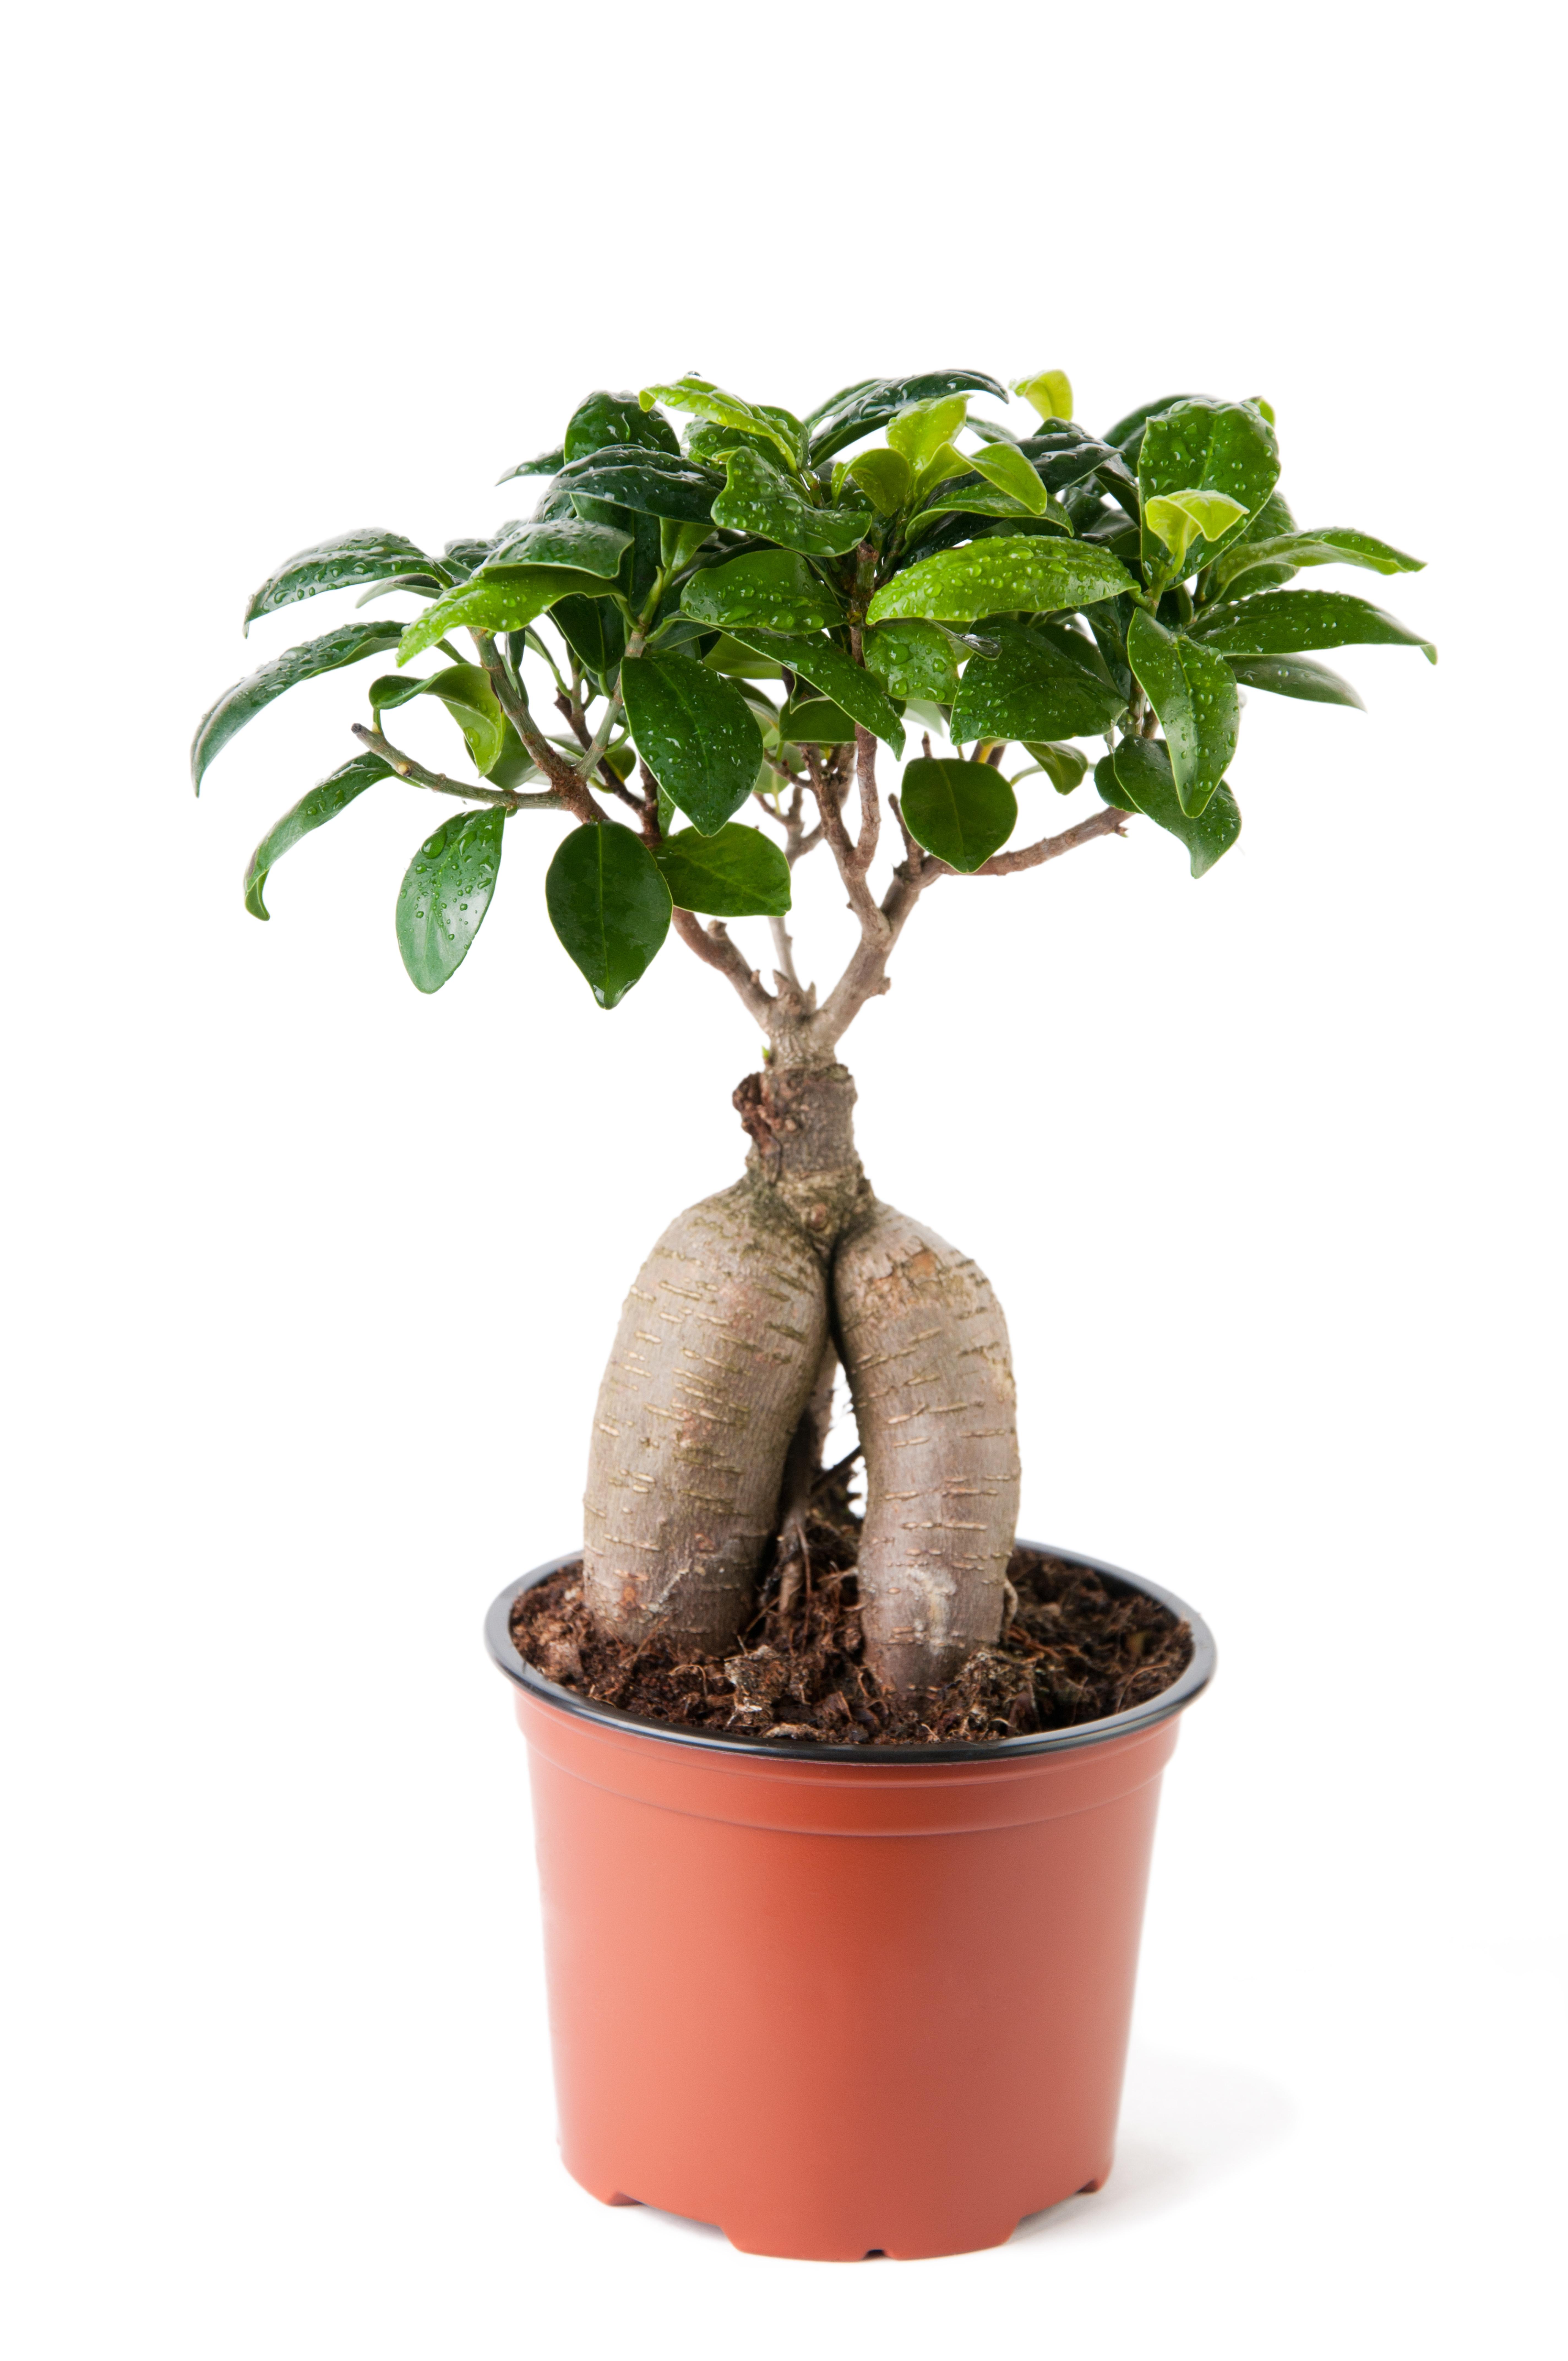 Ginseng Ficus Bonsai | How to Take Care of a Bonsai Tree